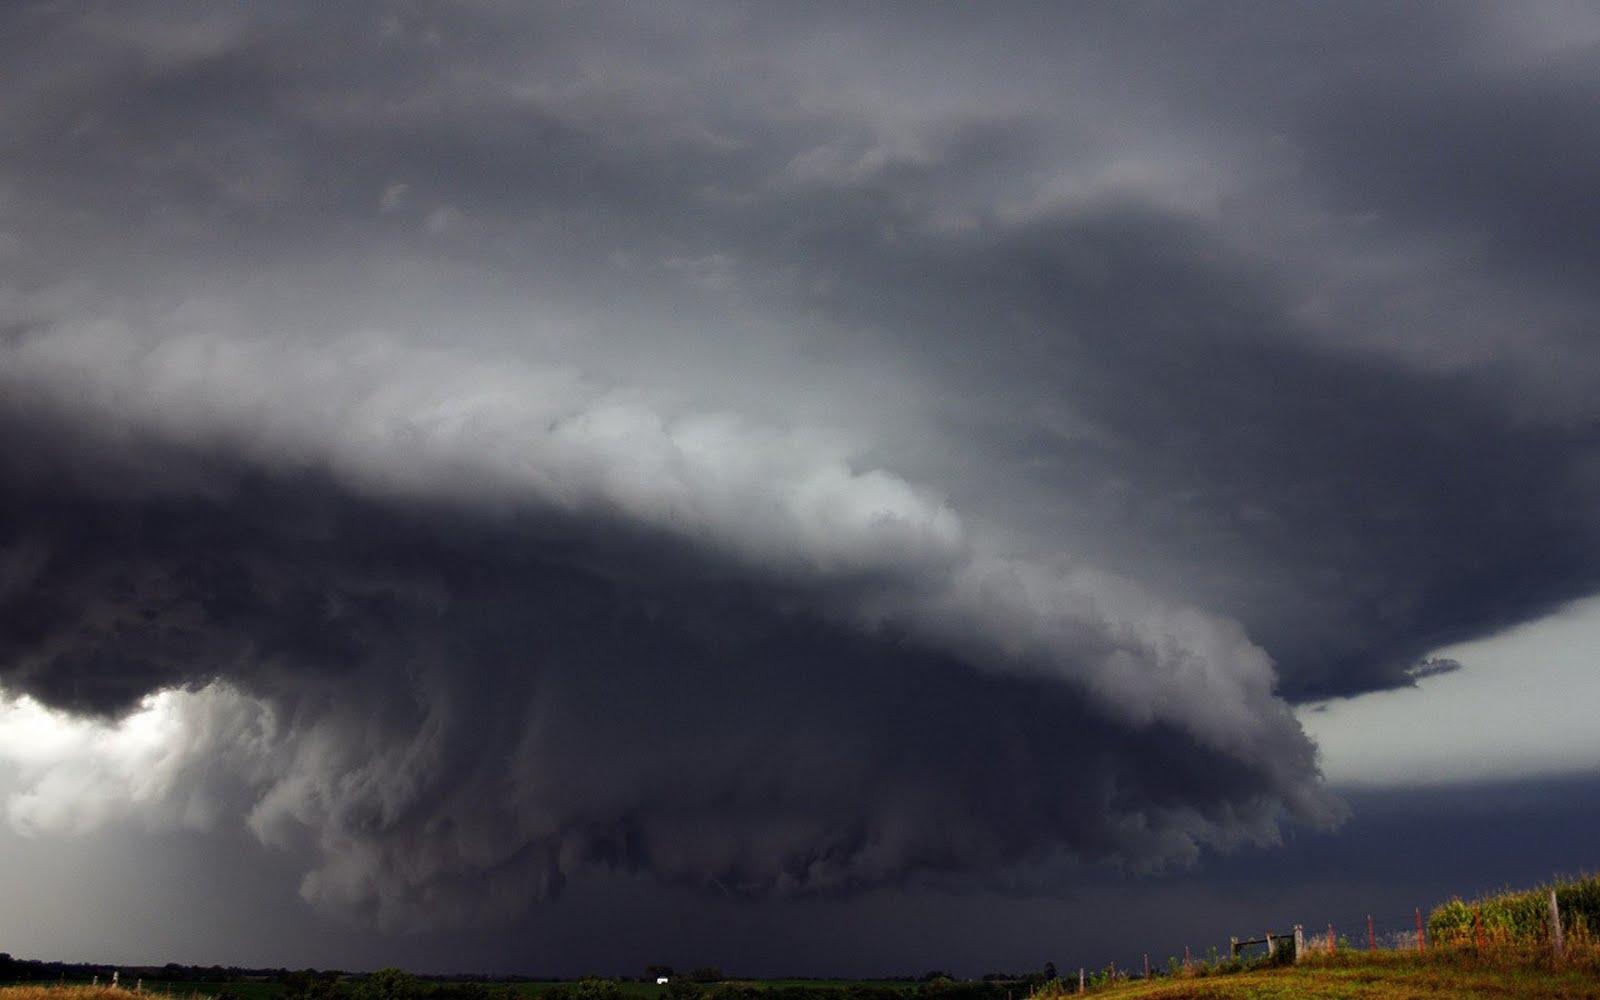 http://1.bp.blogspot.com/-9DYT4pxwCDY/TgUkIfG4kRI/AAAAAAAAAY8/OwifdoULb2E/s1600/weather.jpg